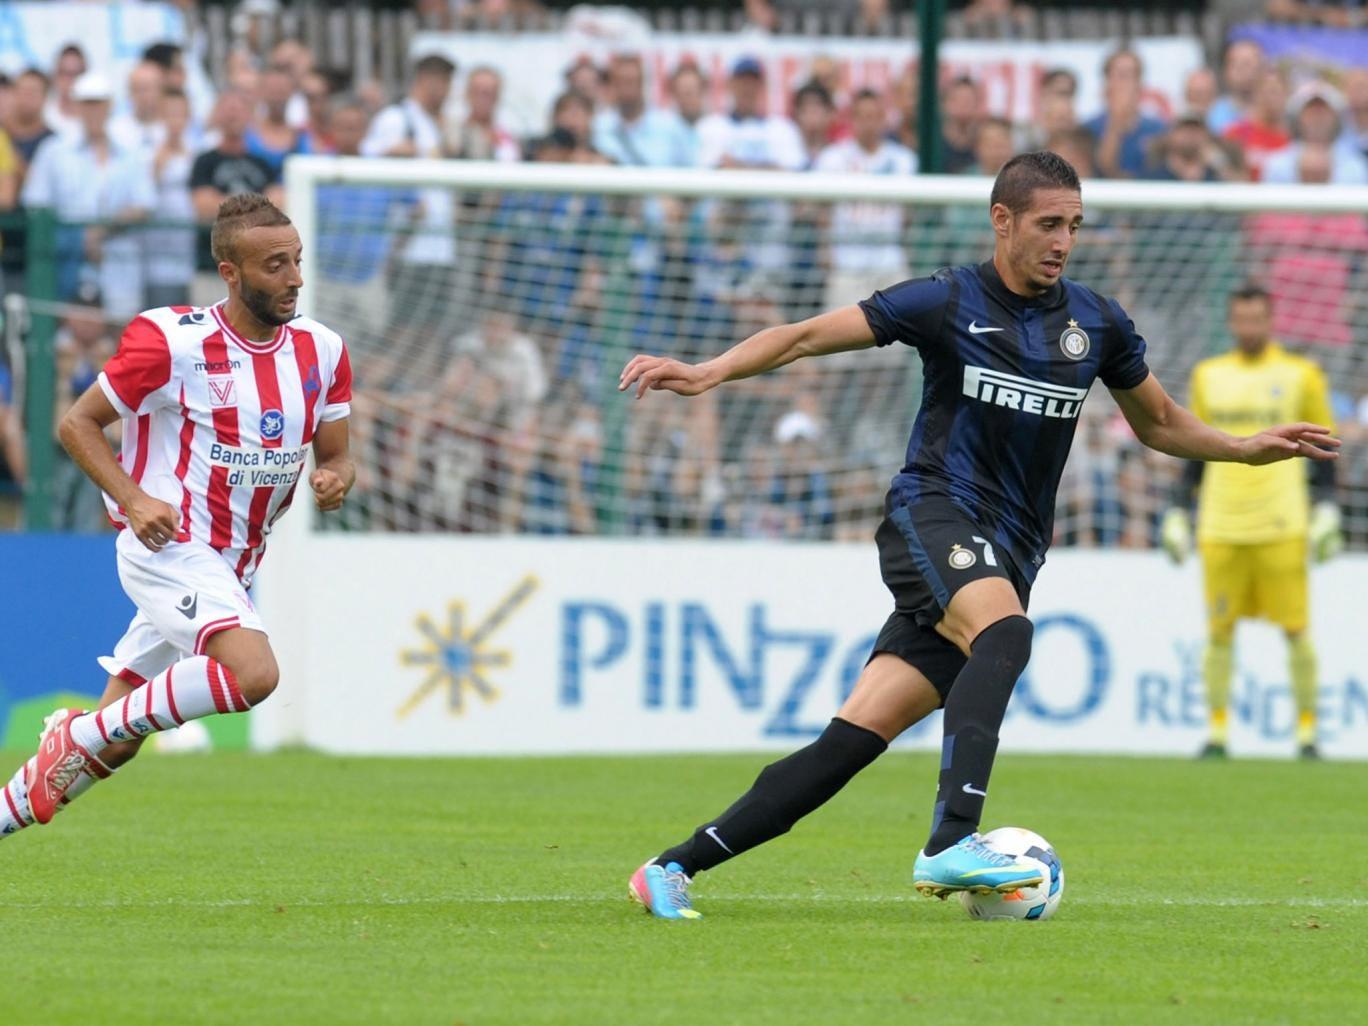 Ishak Belfodil (R) of Internazionale Milano